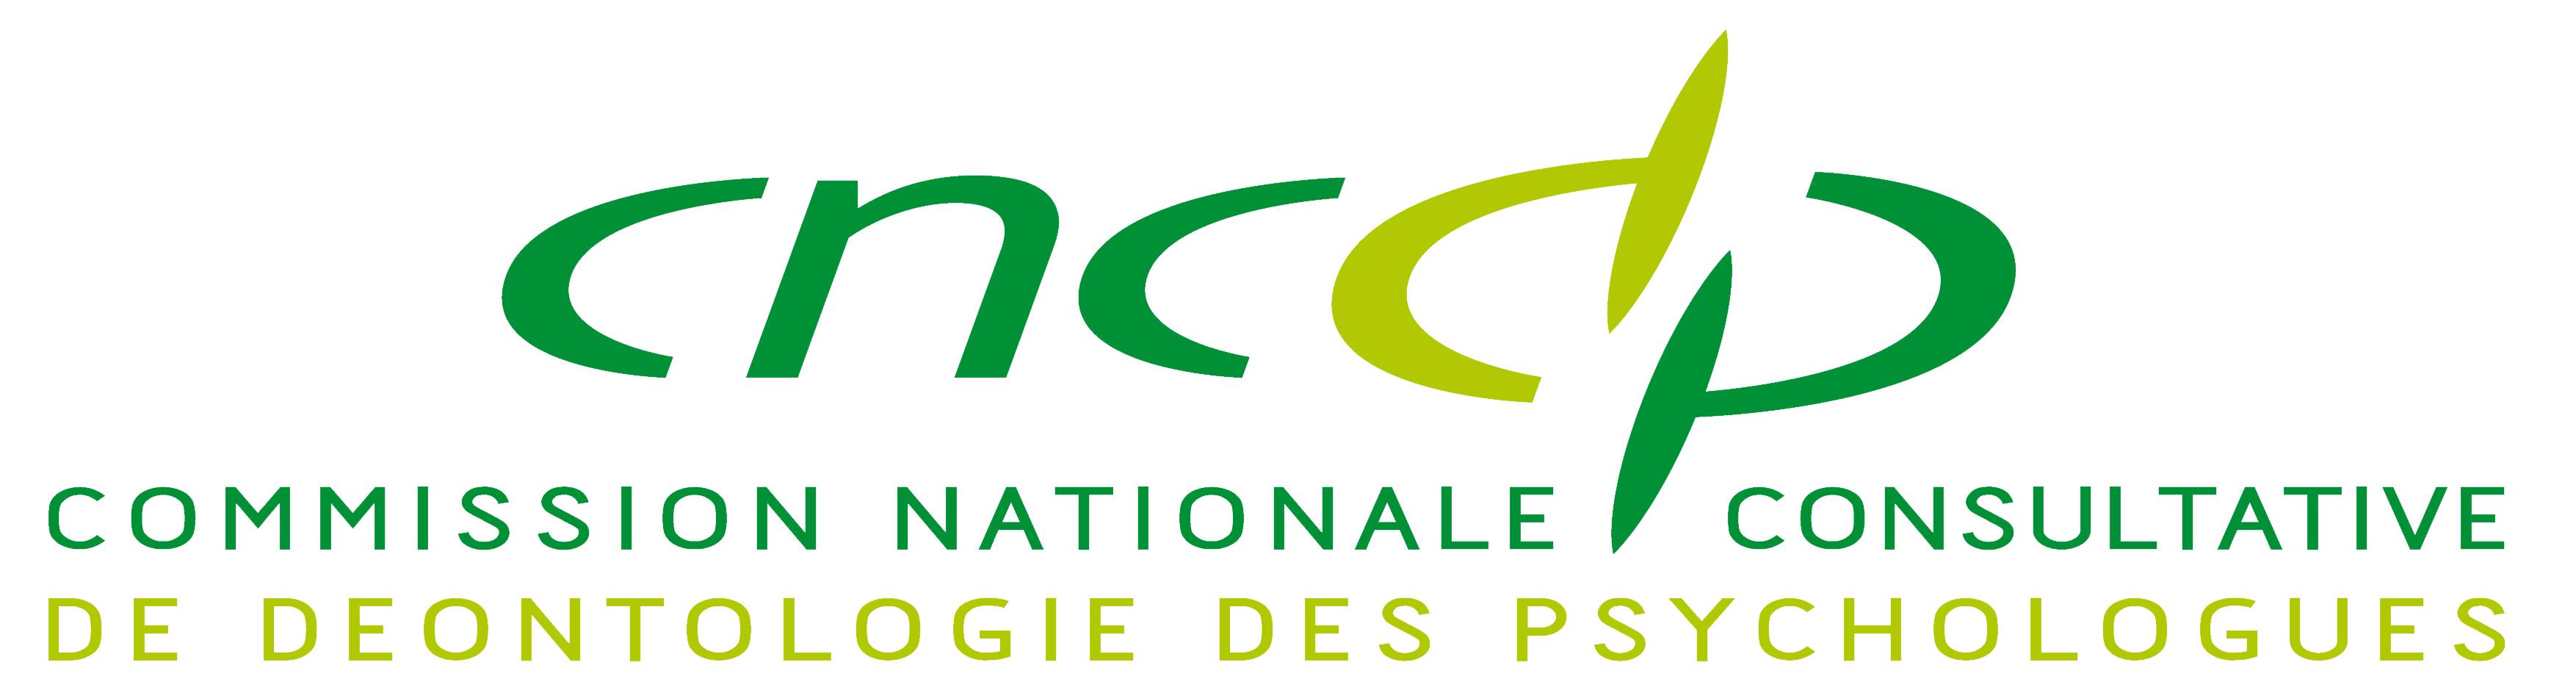 CNCDP logoHD